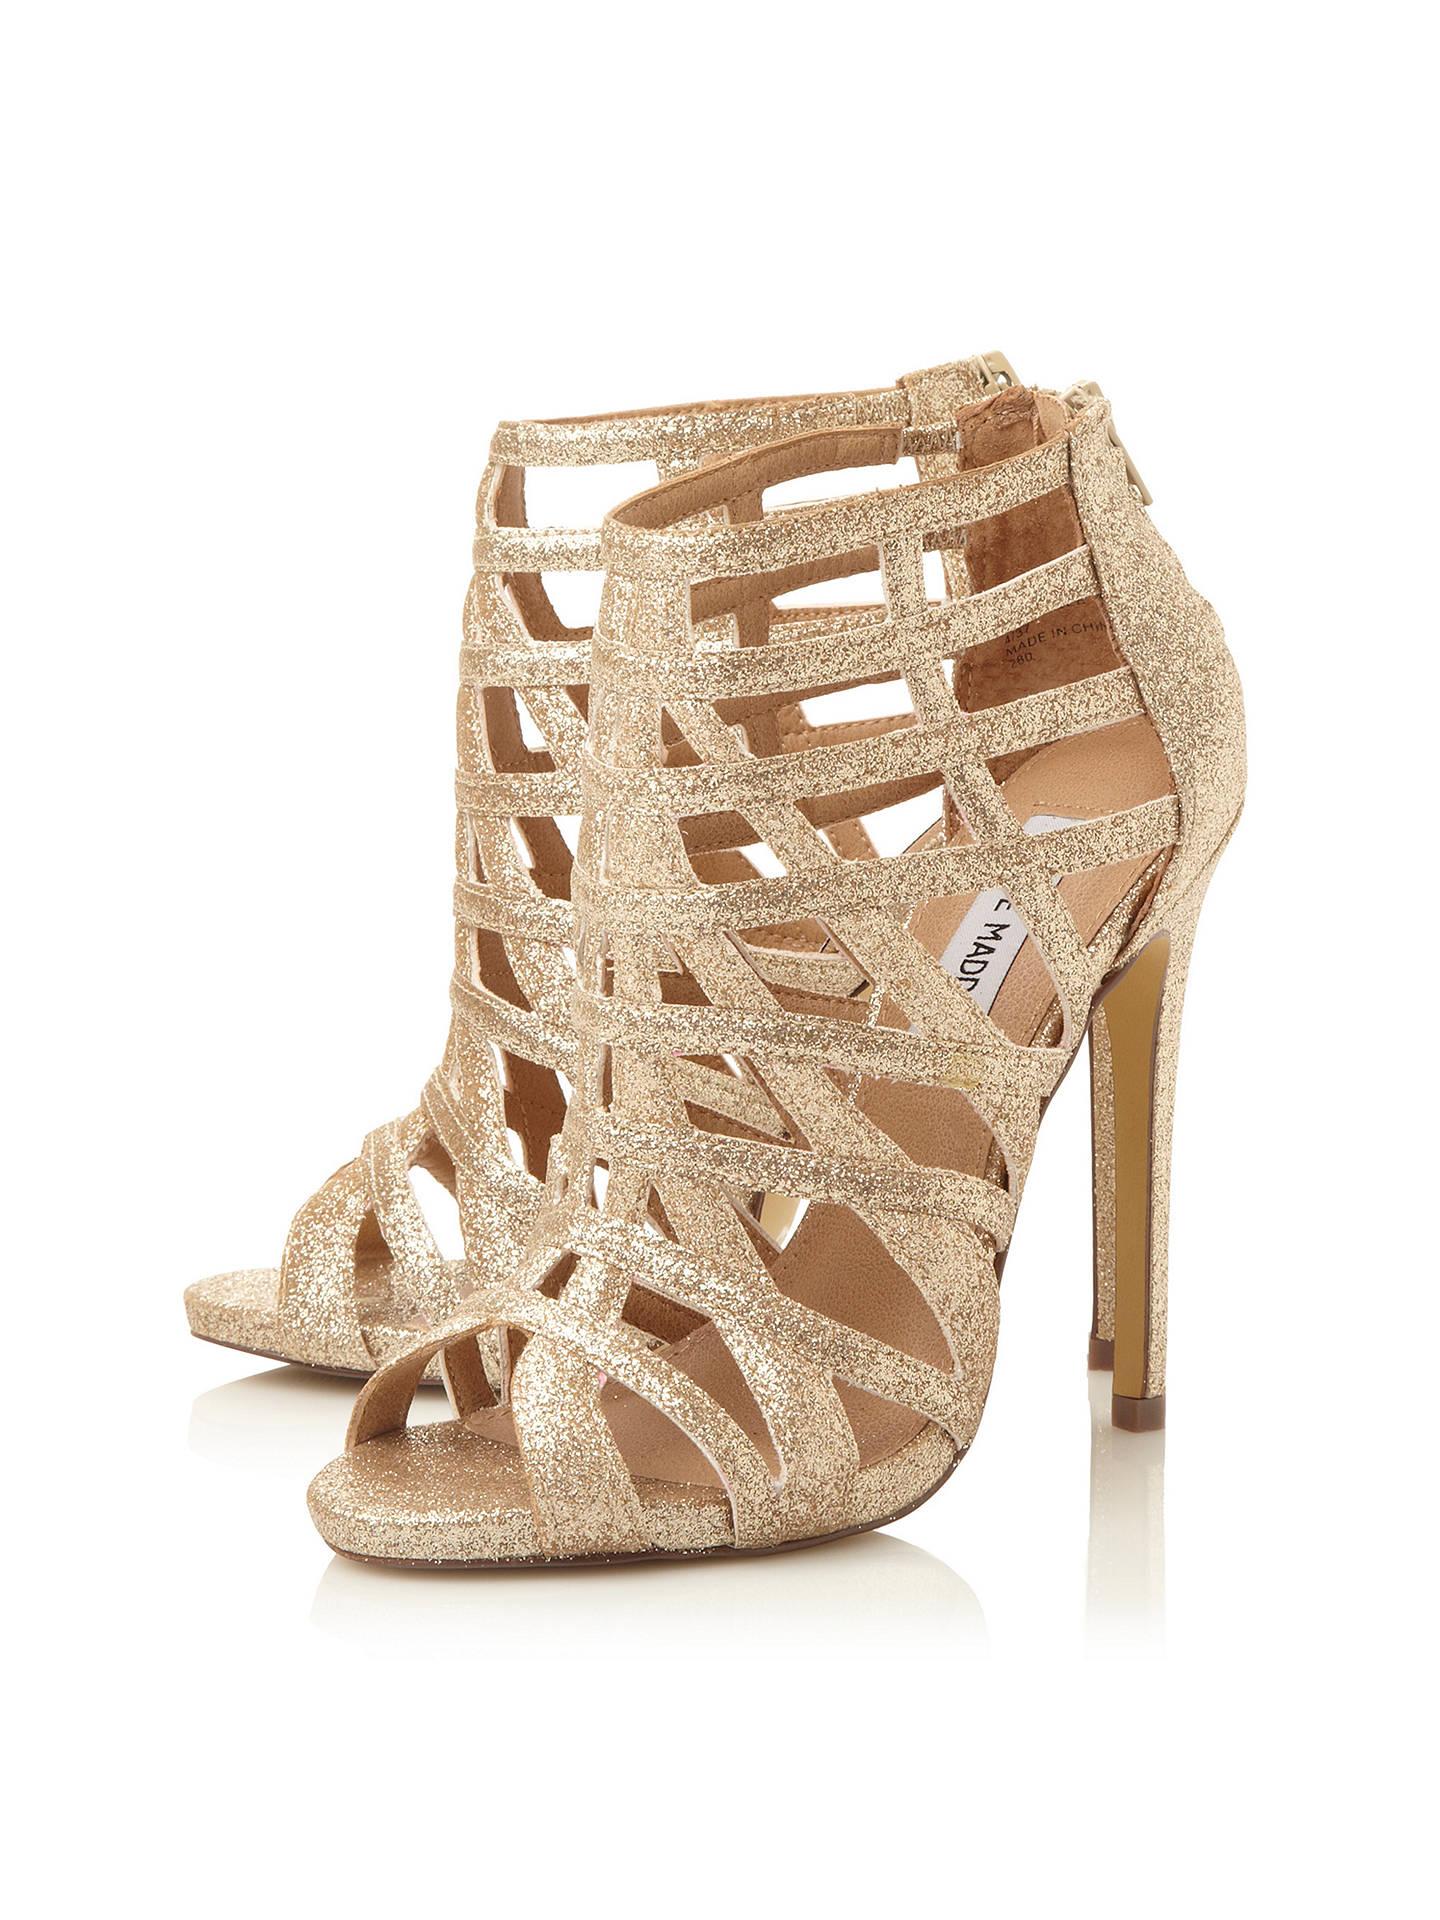 19534658617 Buy Steve Madden Marquee Caged High Heel Sandal